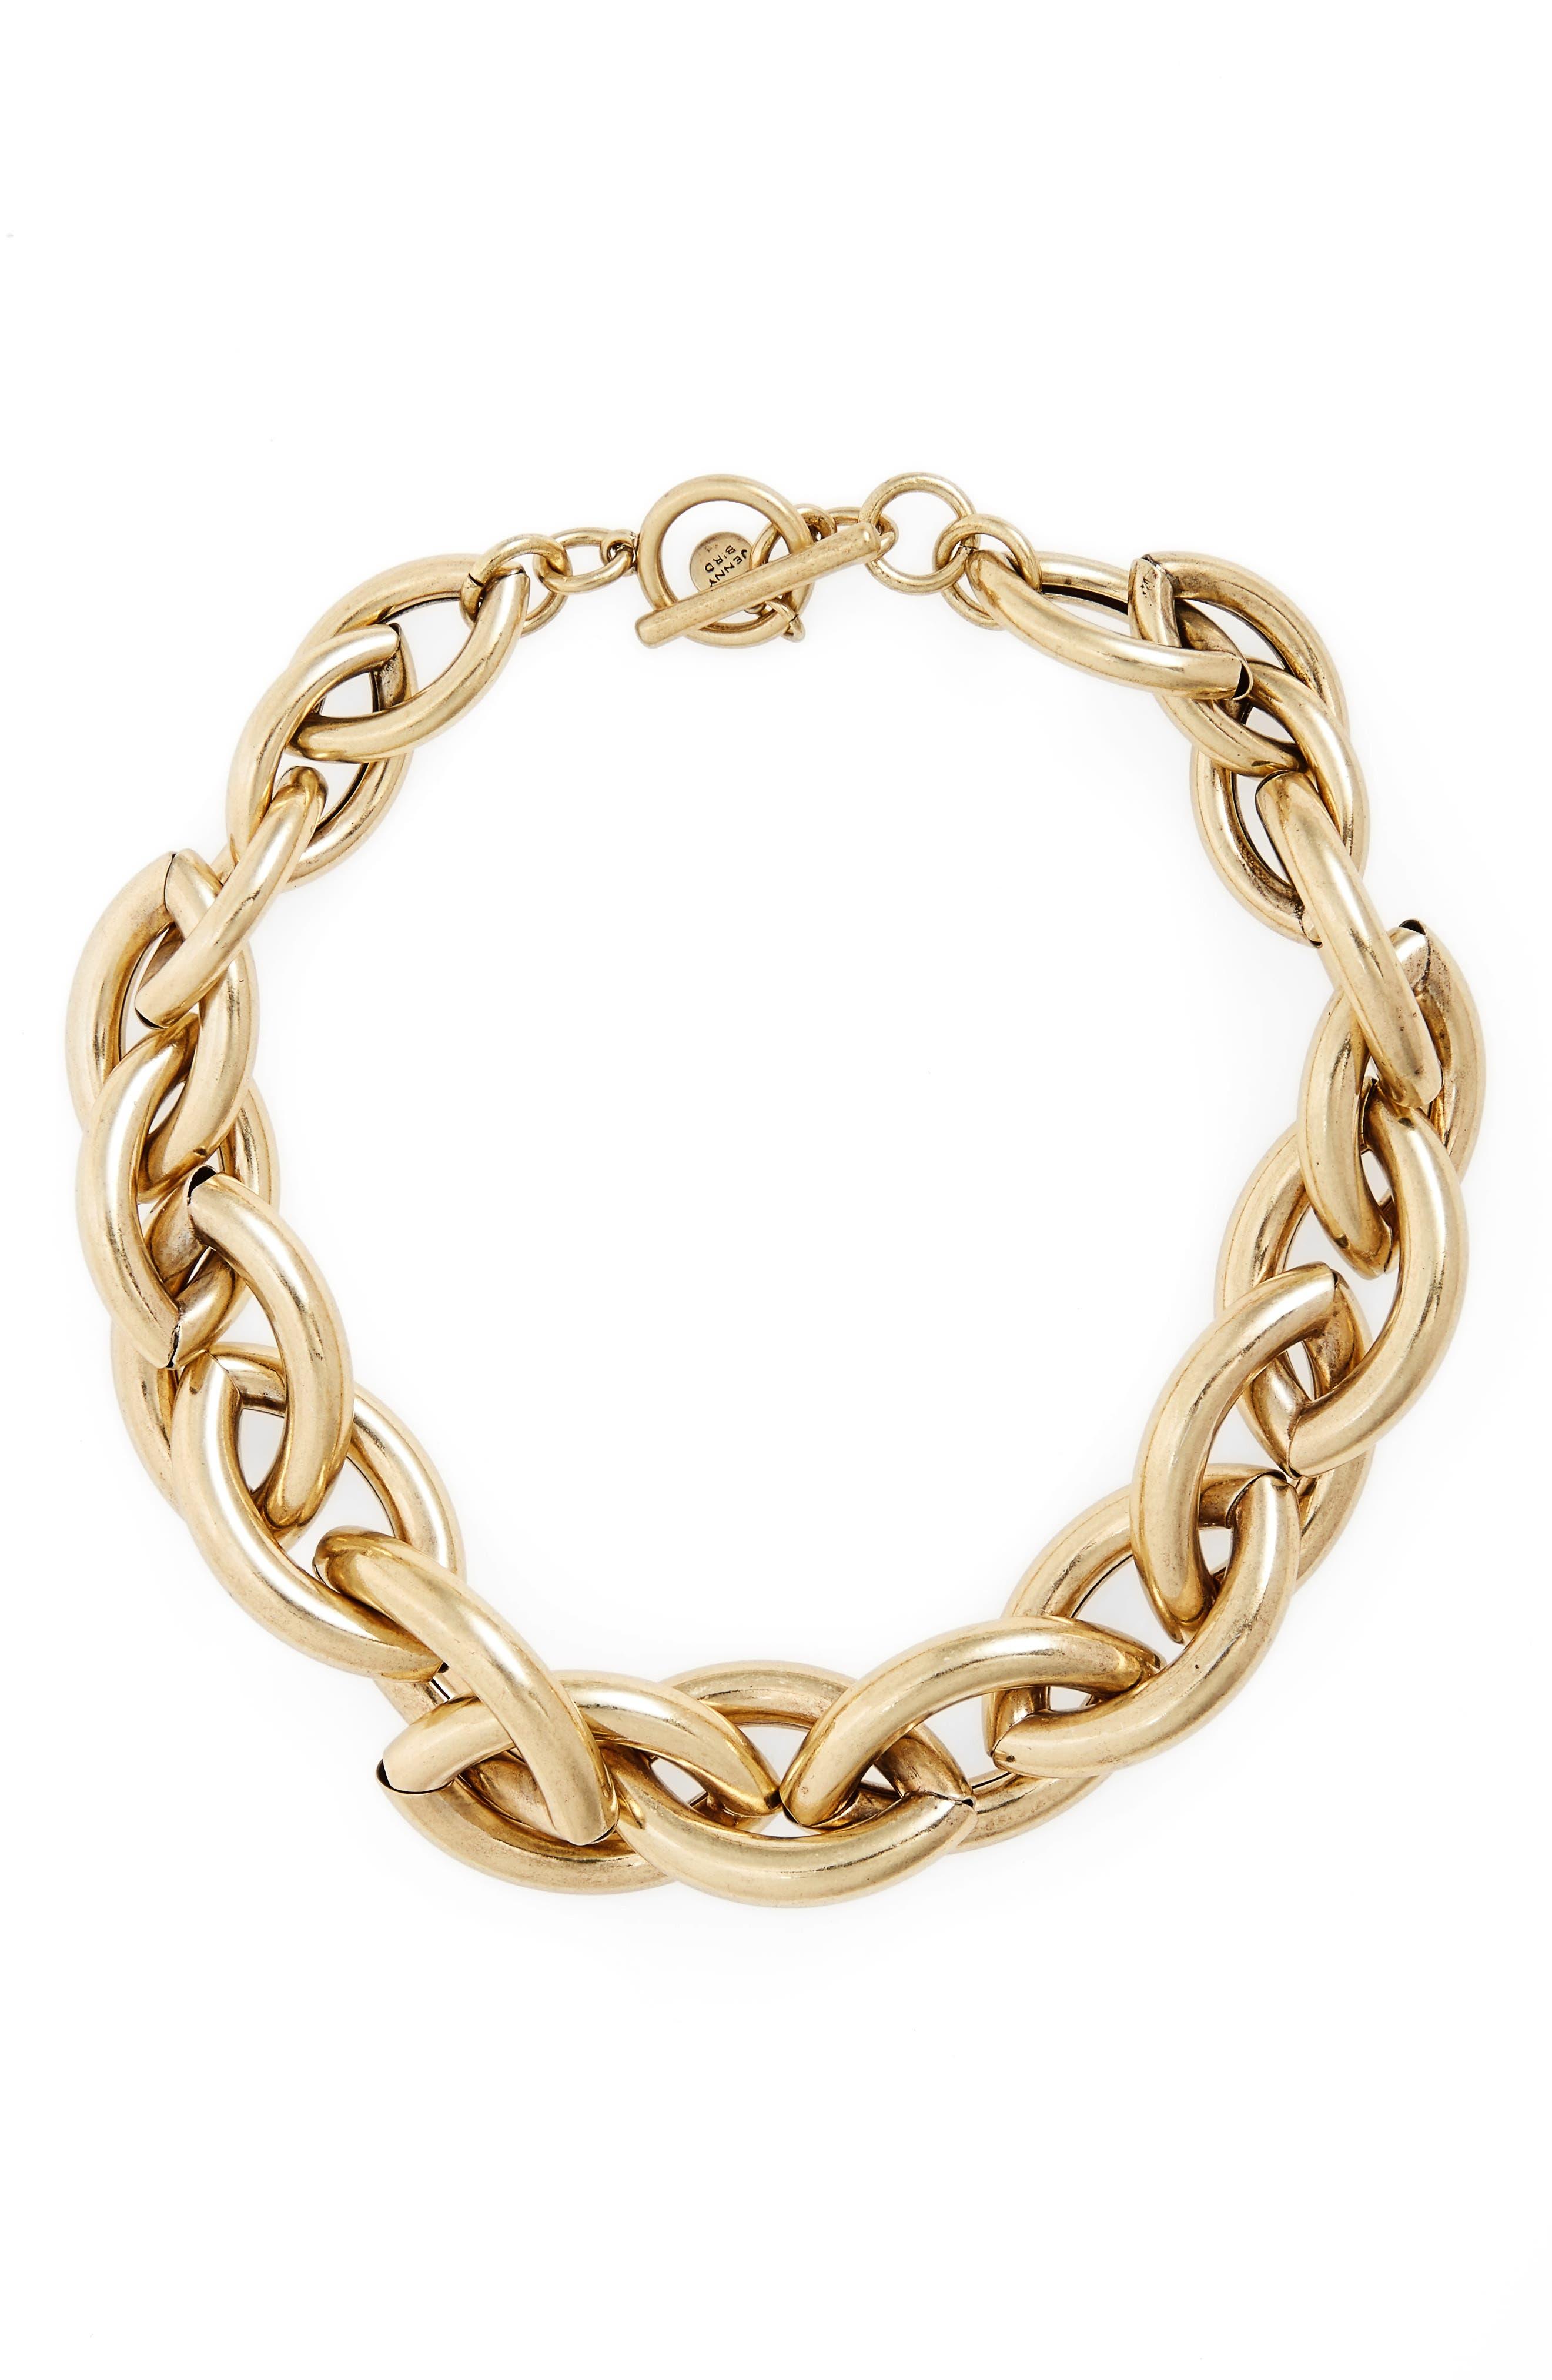 Jenny Bird Sloane Chain Collar Necklace